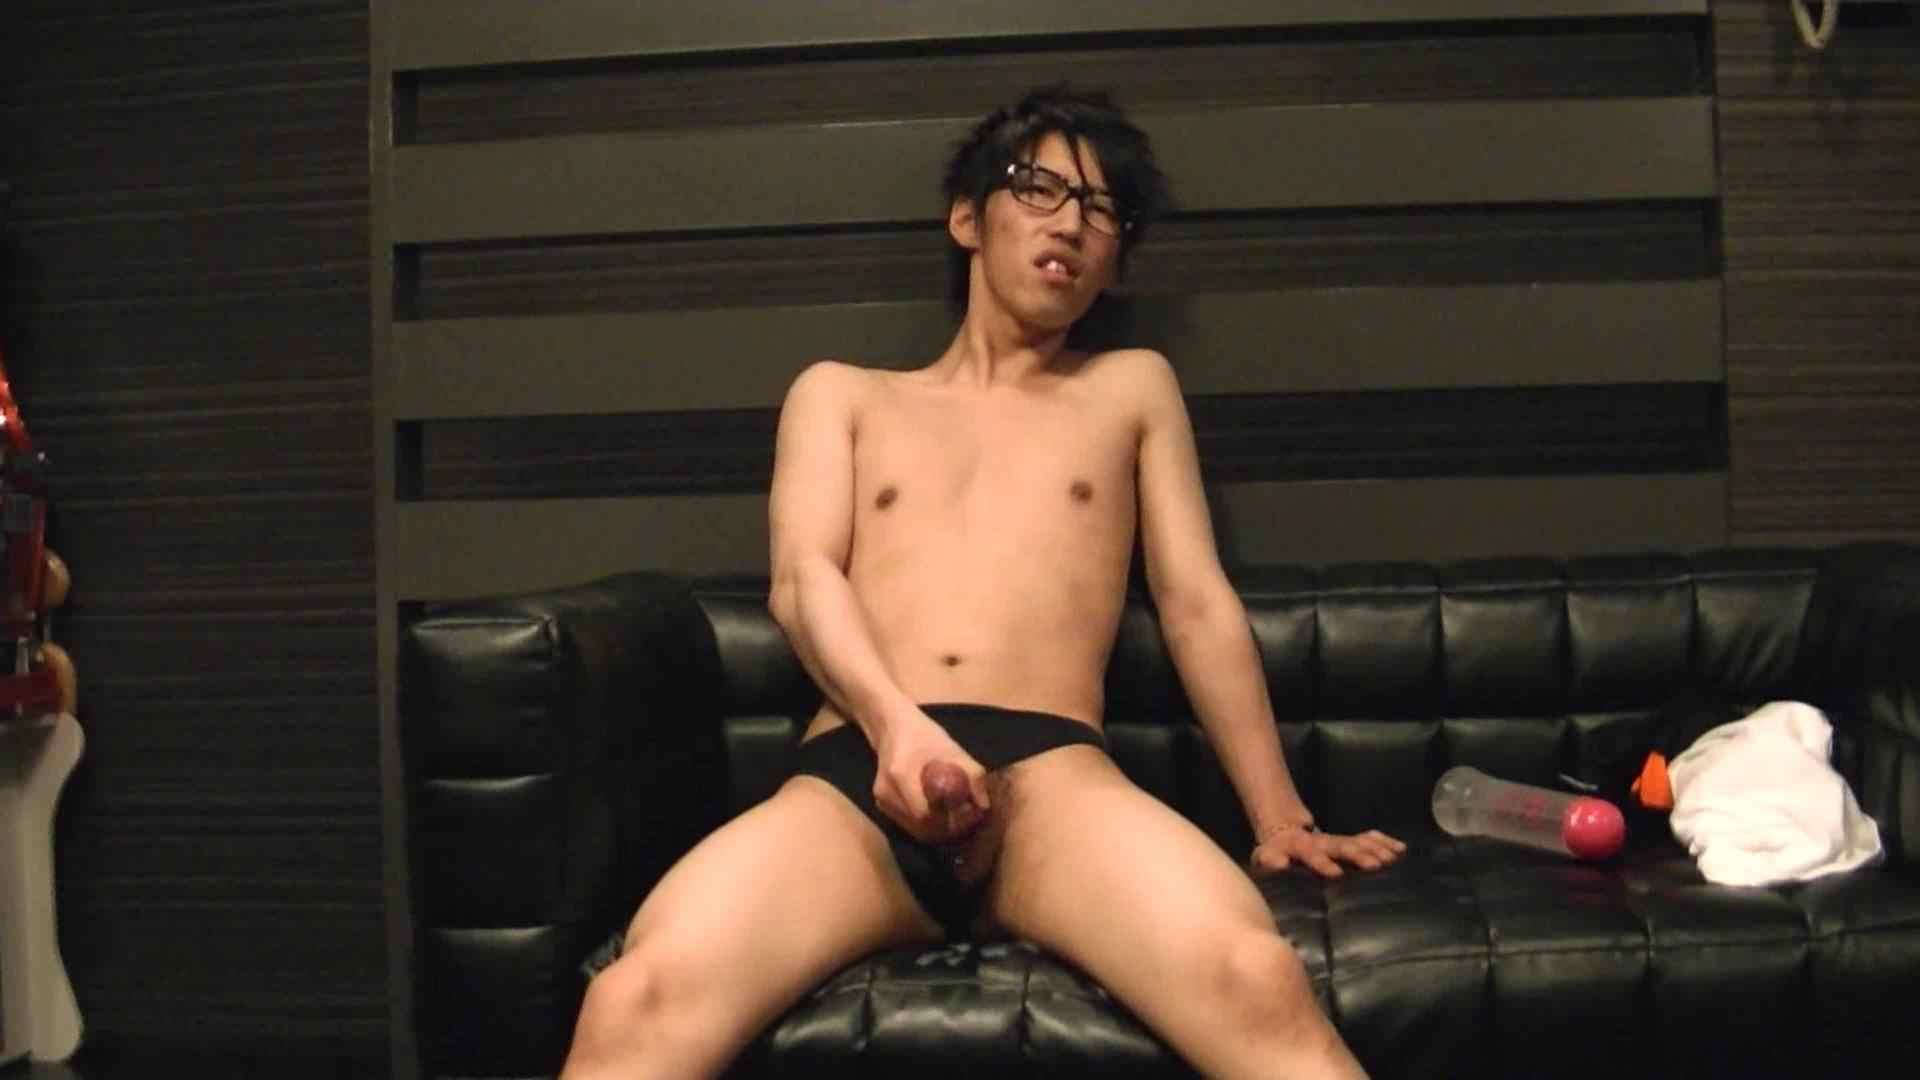 ONA見せカーニバル!! Vol3 男 ゲイ無料無修正画像 89枚 17